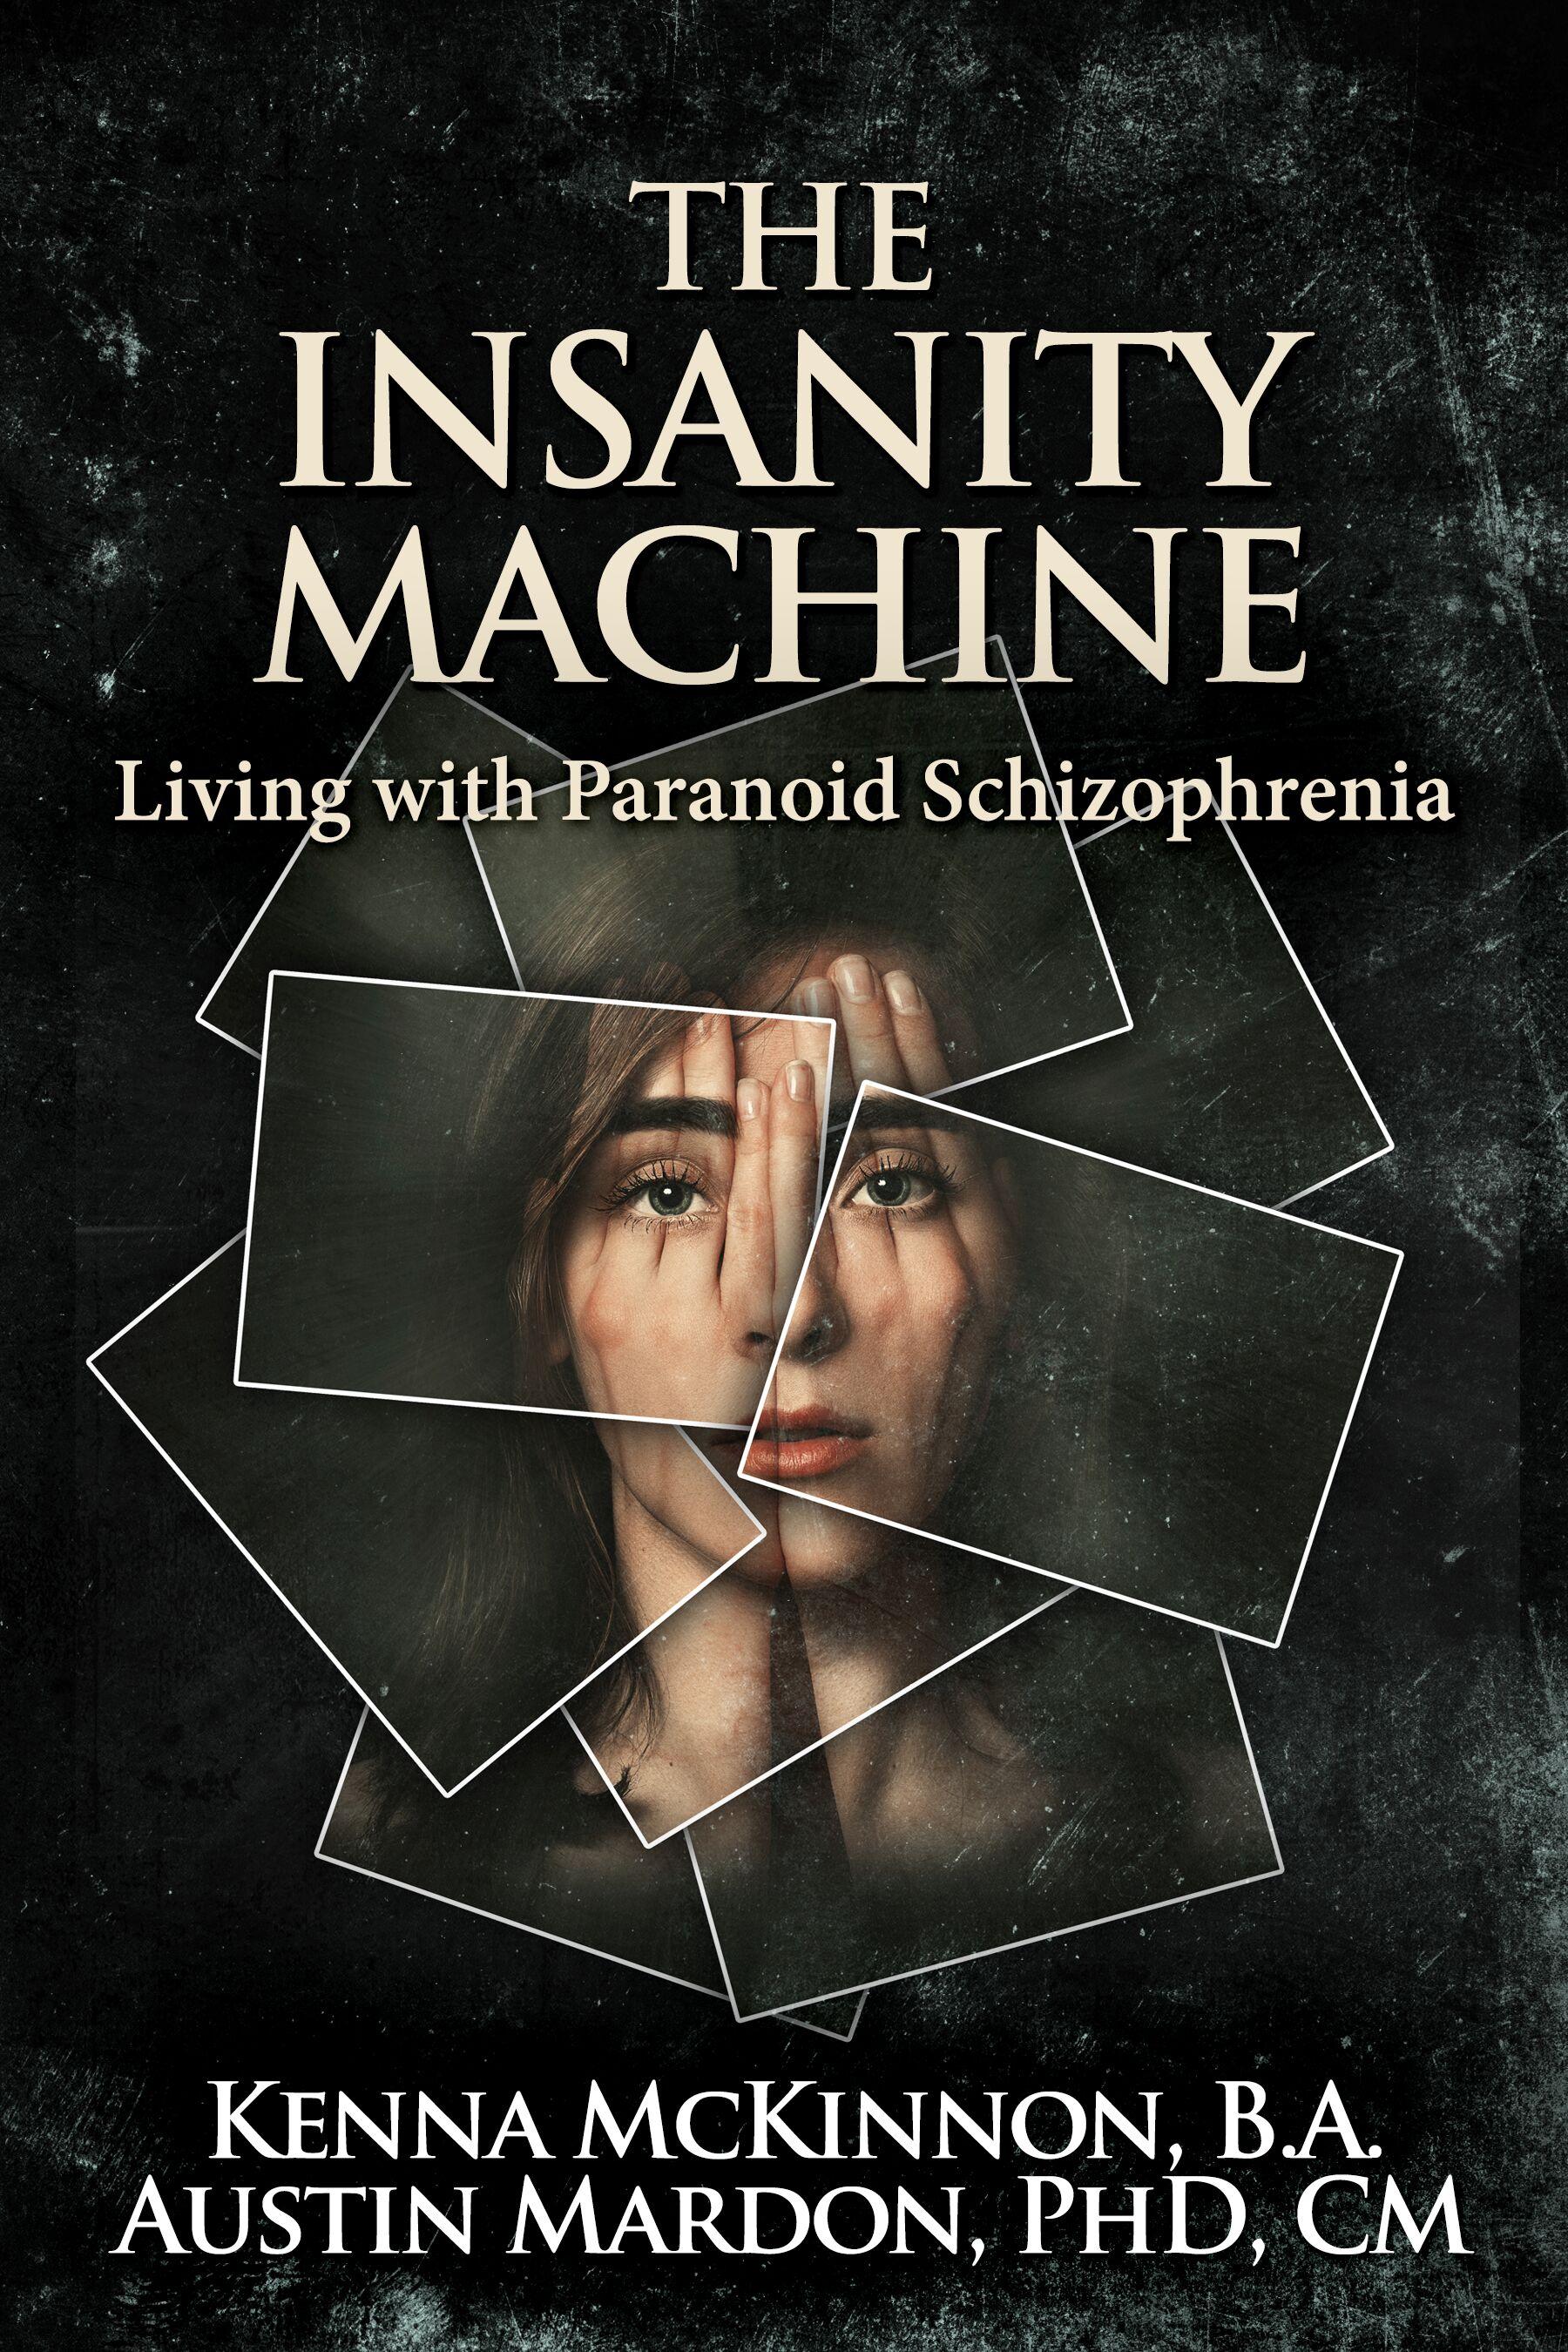 The insanity machine - life with paranoid schizophrenia